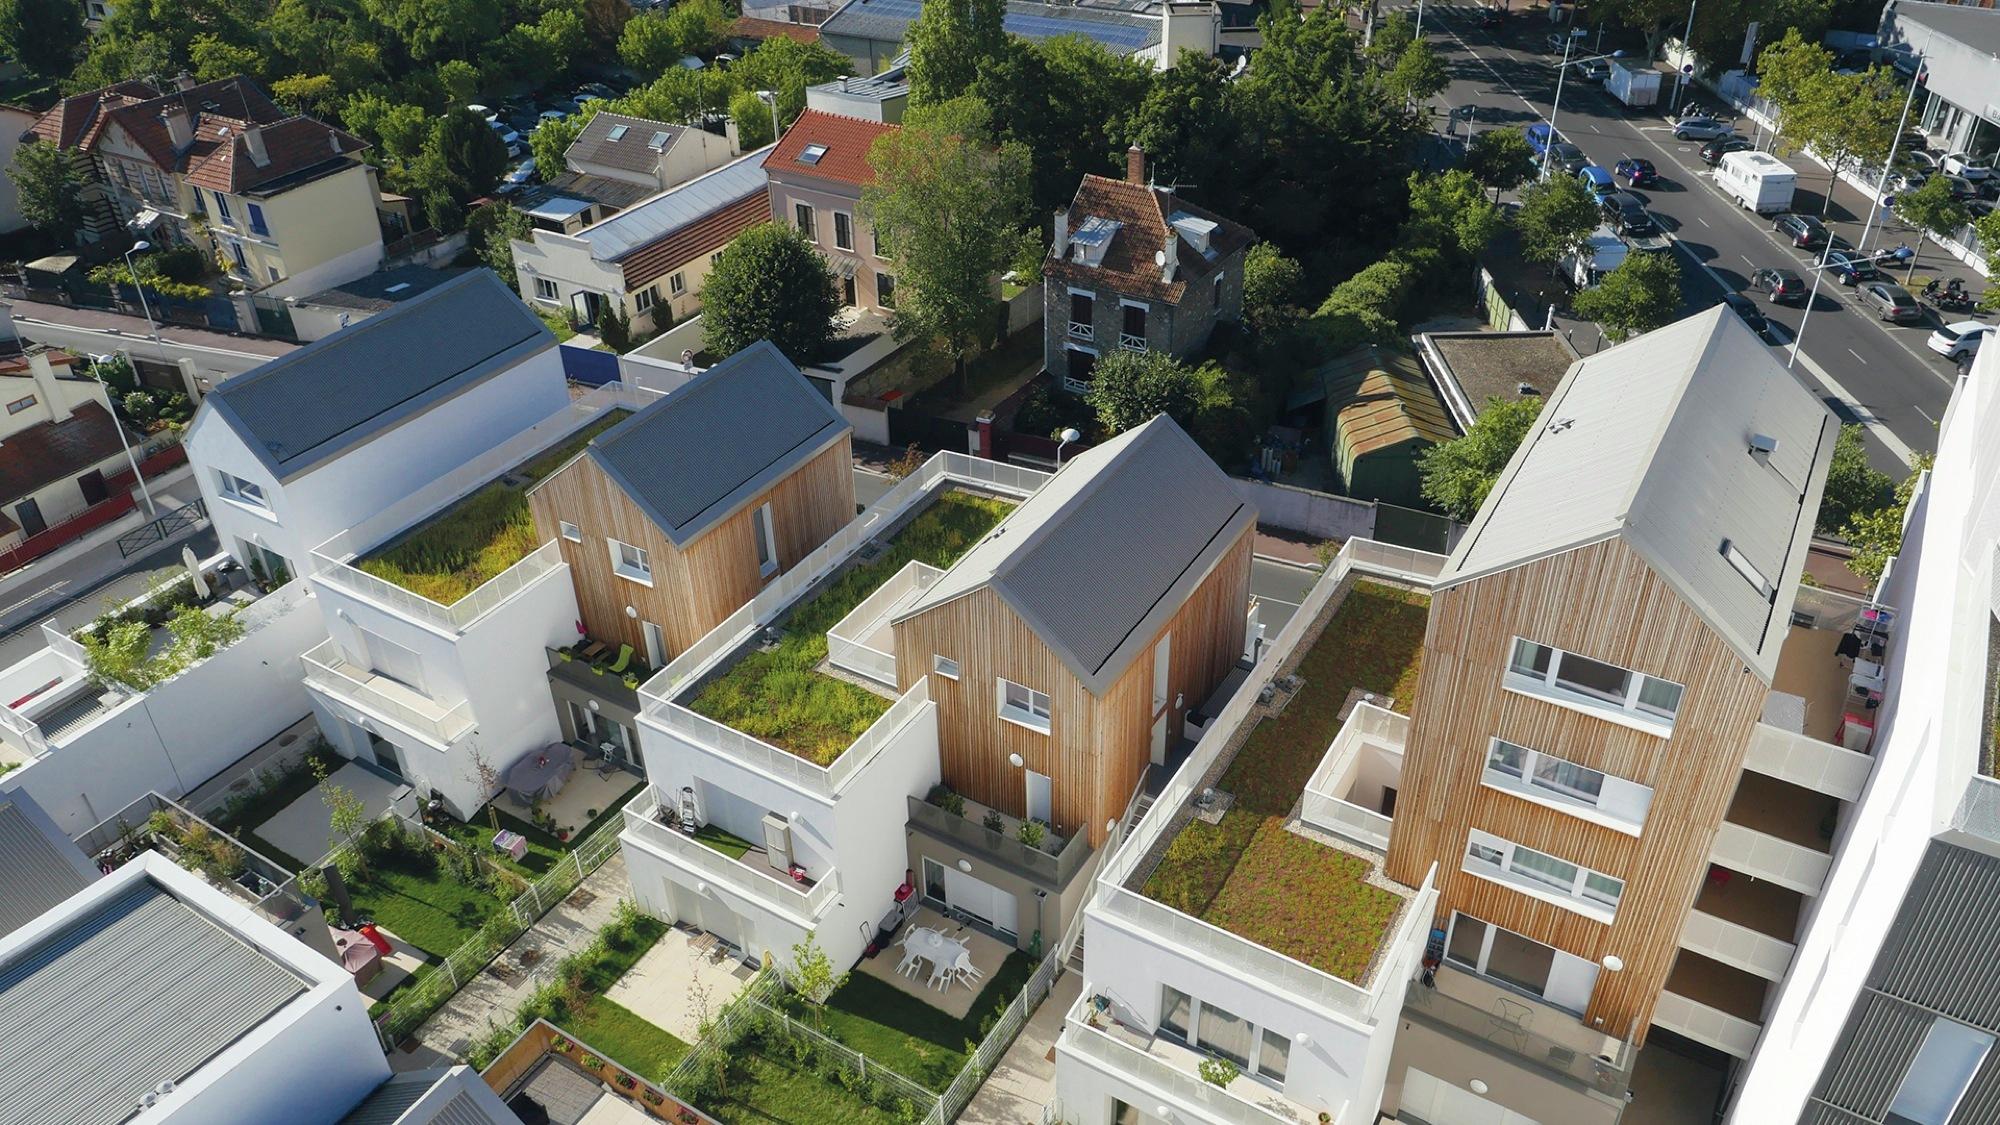 157 housing units in nanterre atelier du pont archdaily - Atelier arquitectura ...